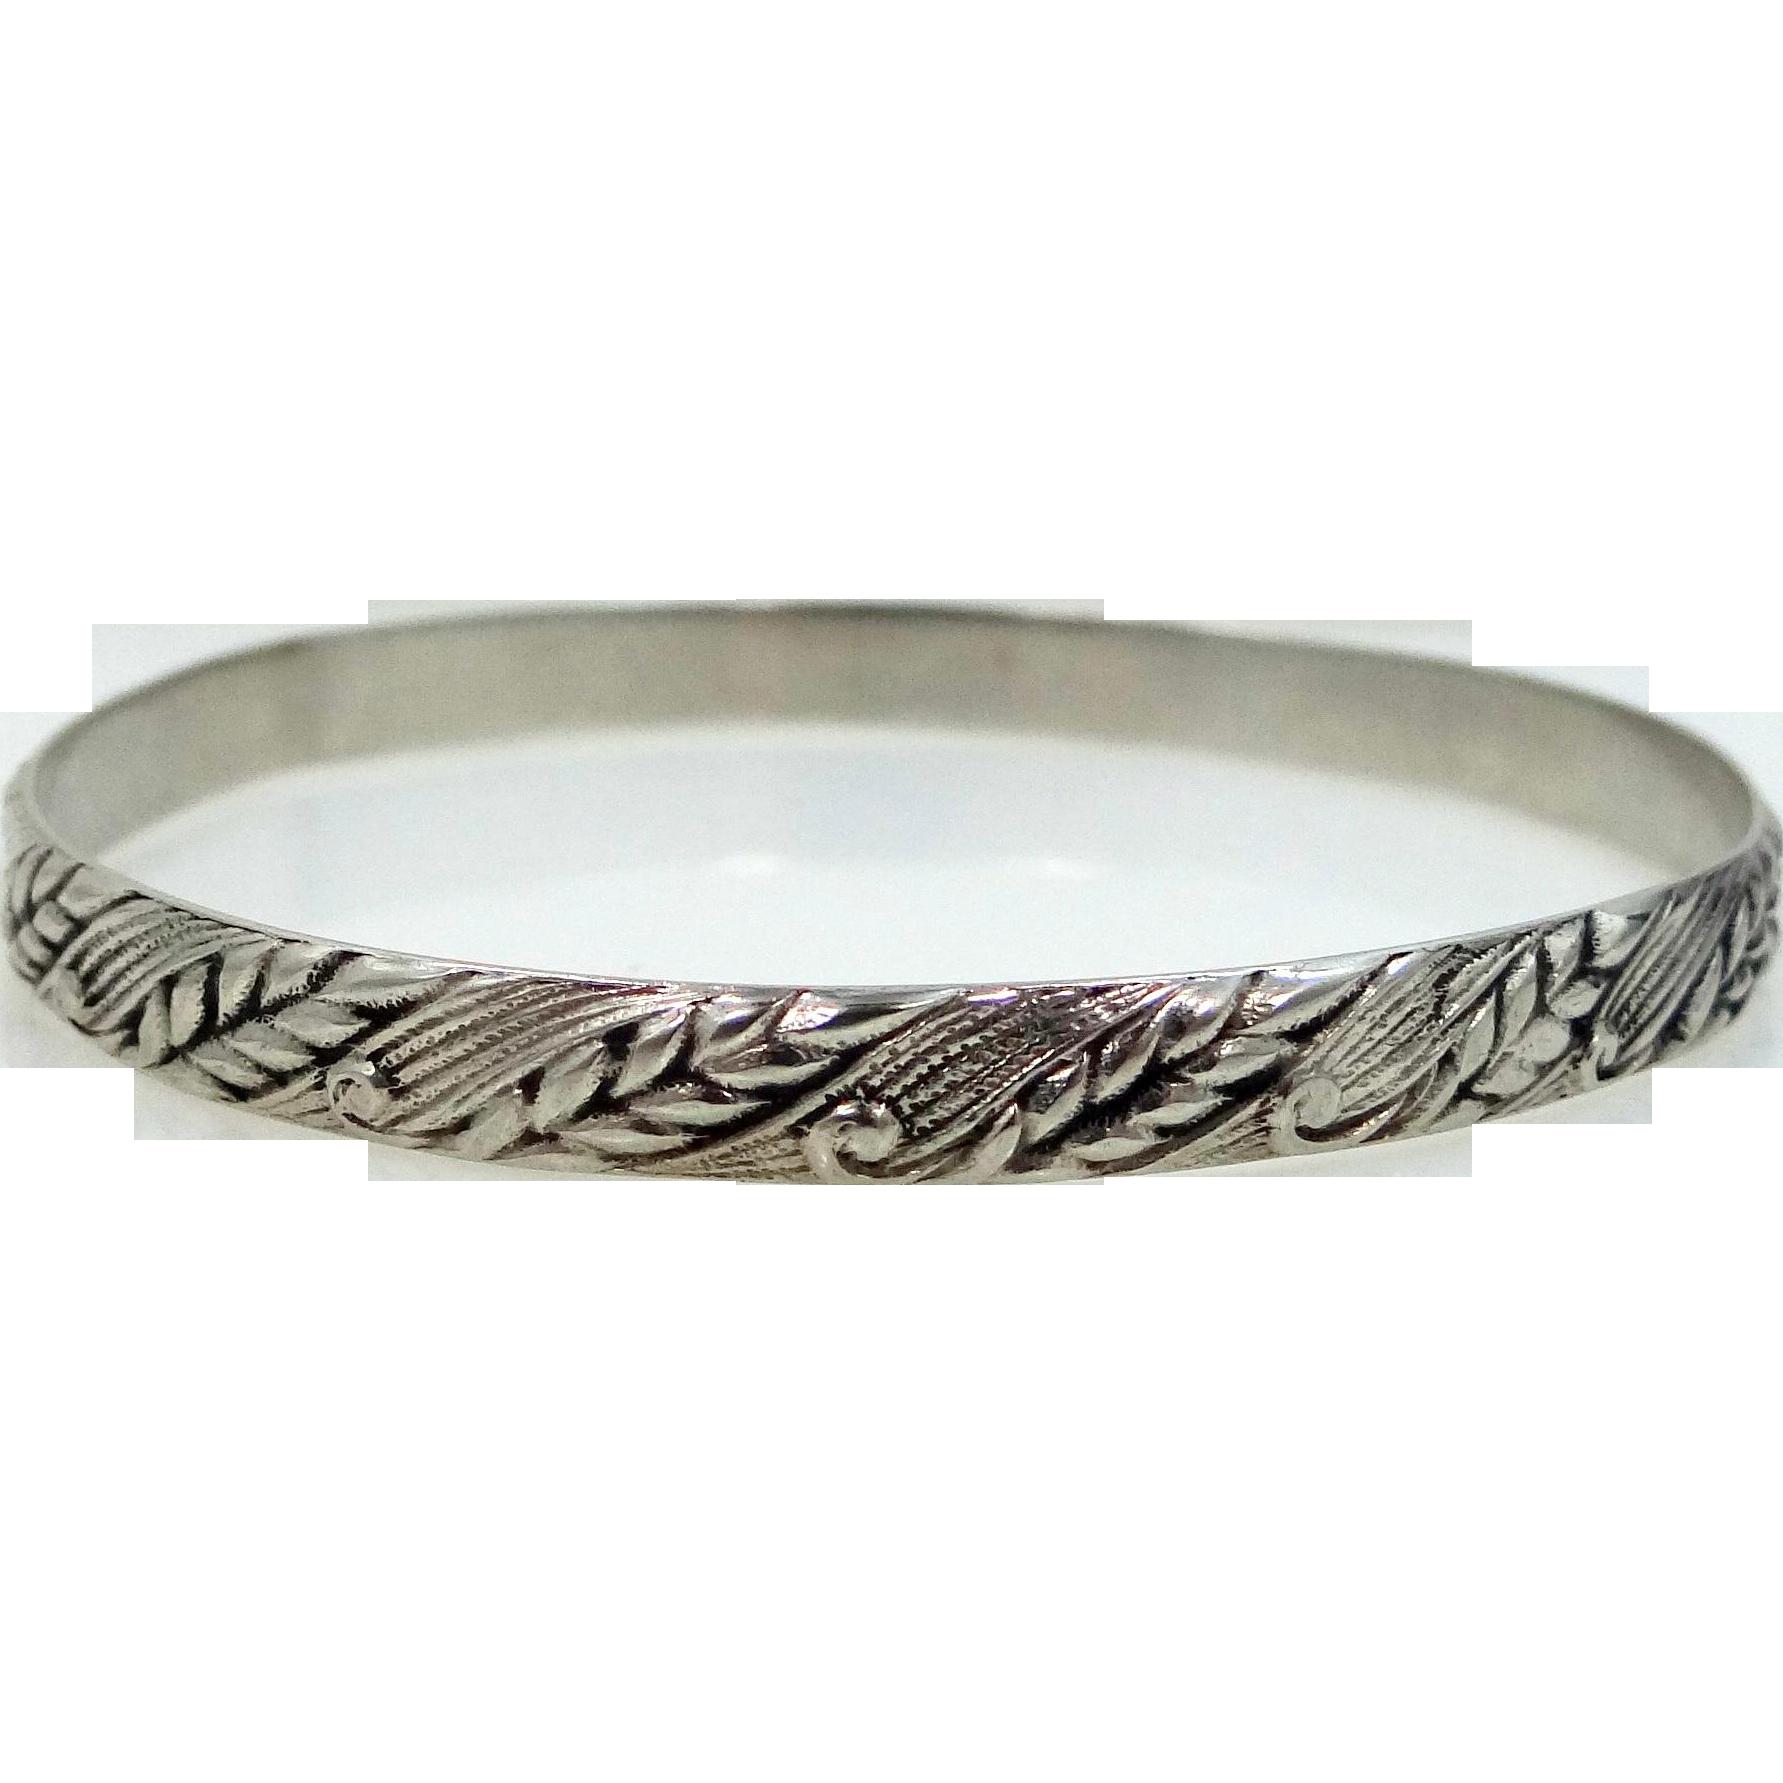 Danecraft Felch . Sterling Silver Bangle Bracelet In